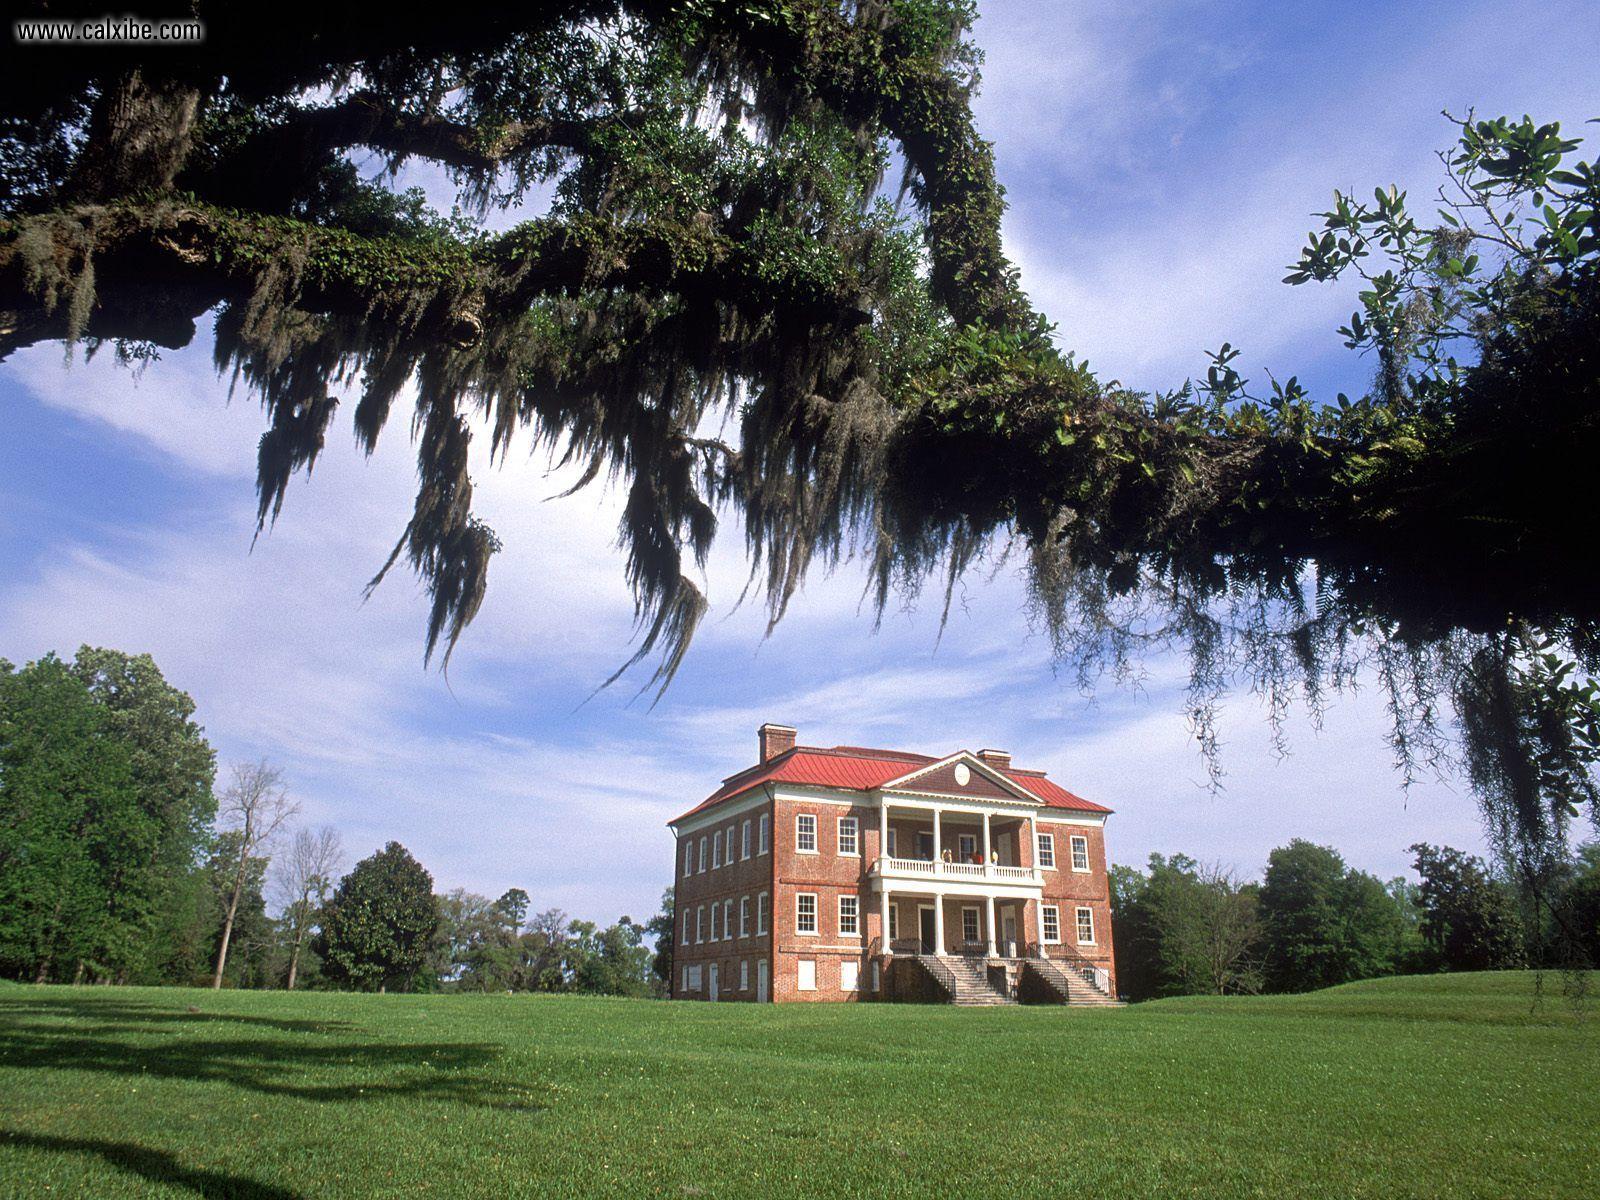 Drayton Hall Plantation Charleston South Carolina picture nr 160 1600x1200